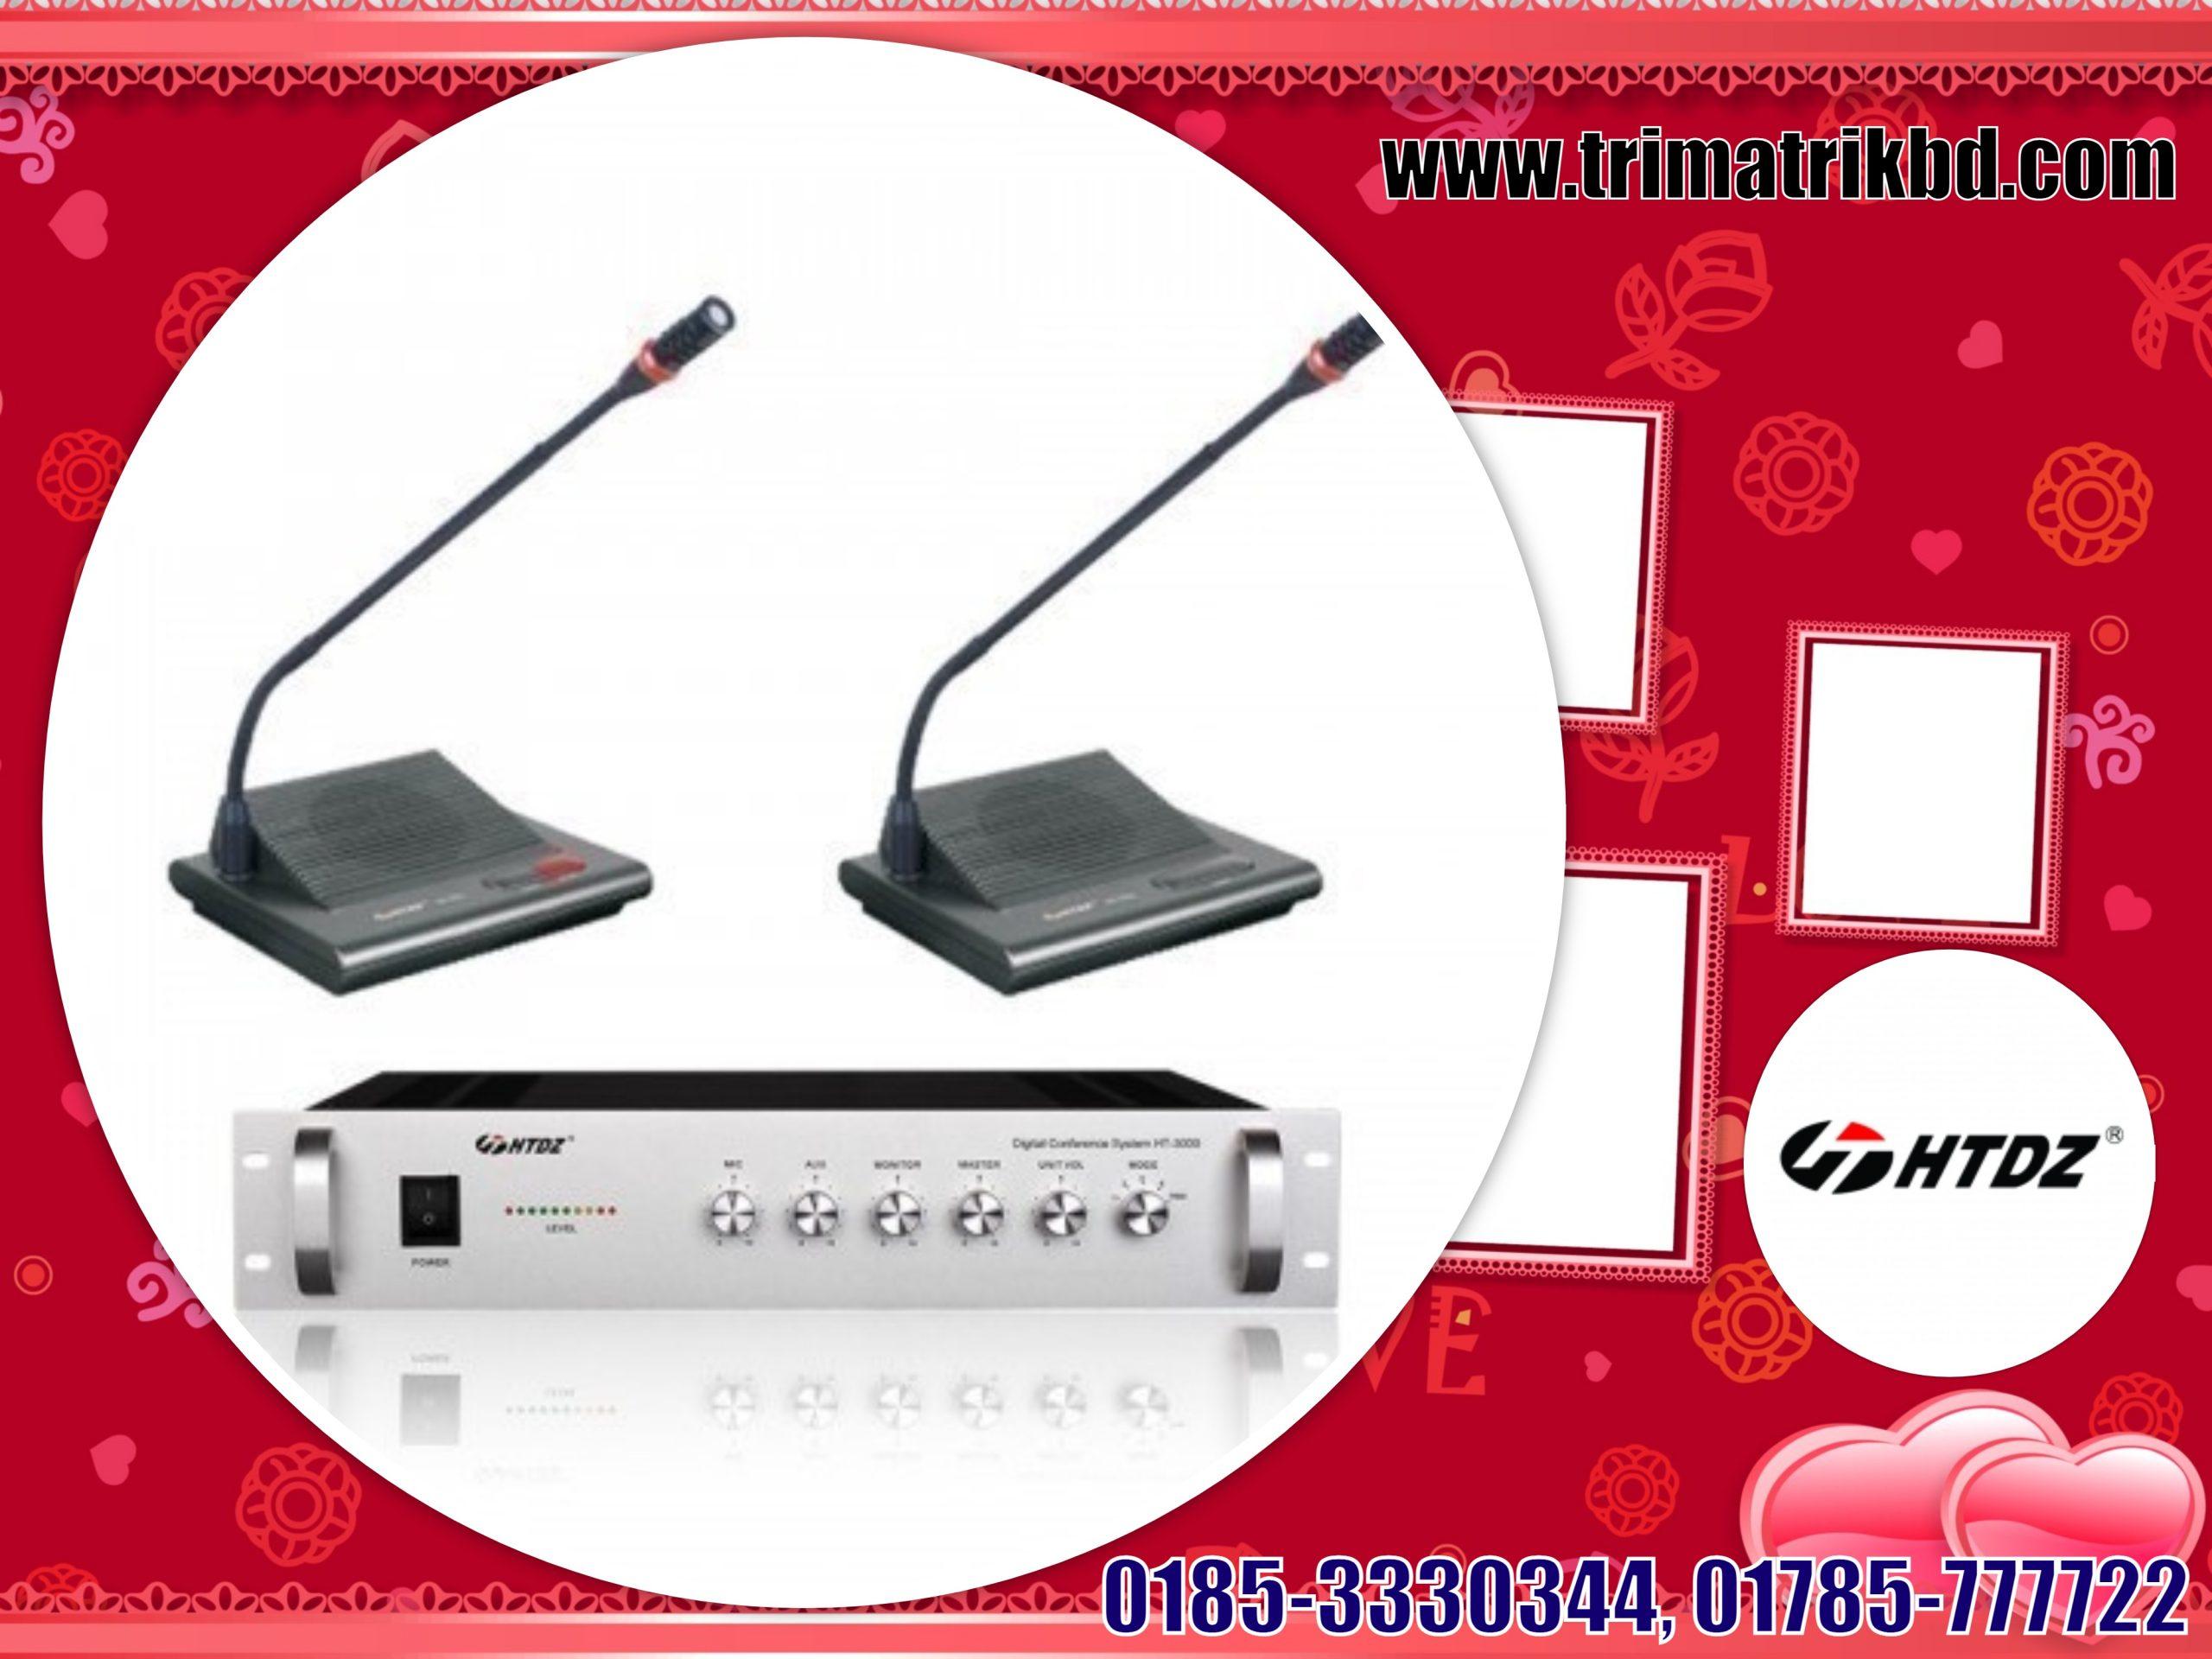 HTDZ Conference System Price in Bangladesh, HTDZ HT-3000 Bangladesh